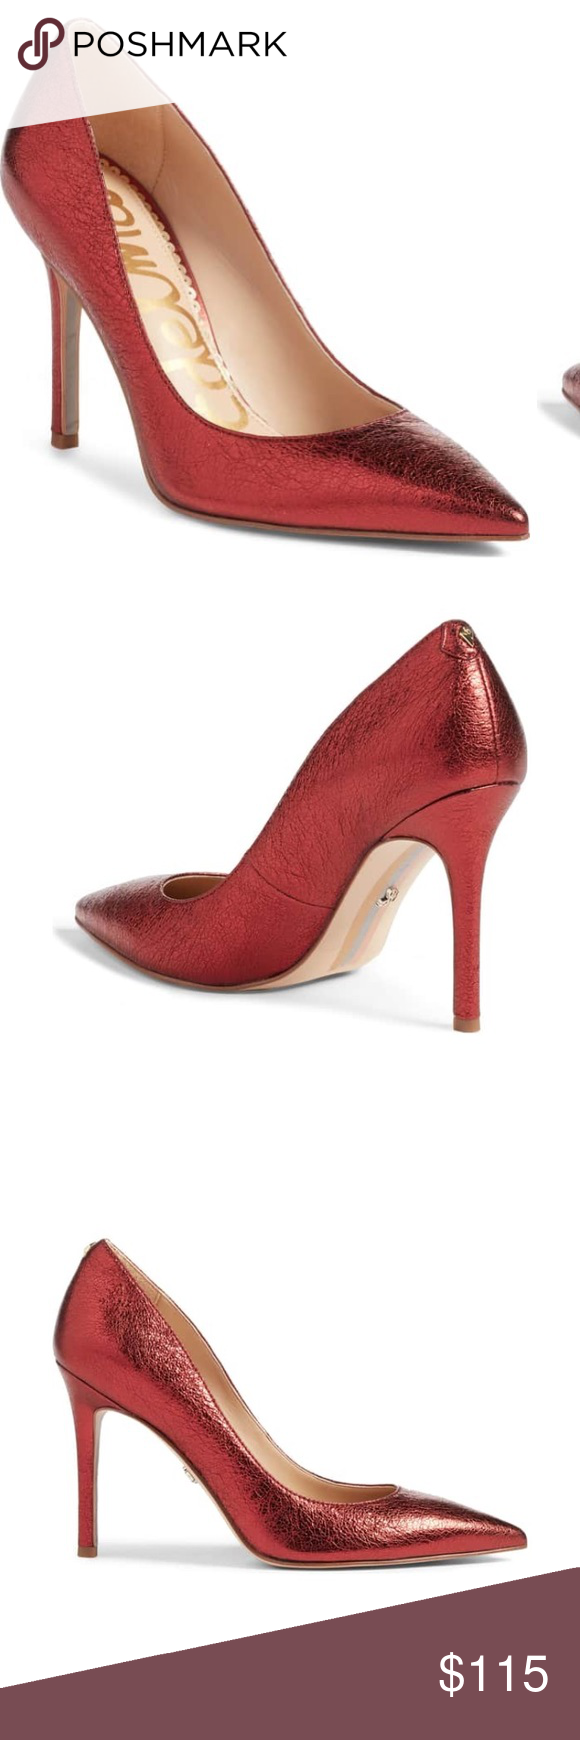 2feaeb3281e9 Elegant · Legs · Sole · Classic · Sam Edelman Metallic Rust Hazel Pointy  Toe Pump Sam Edelman metallic rust pointy toe pump Like